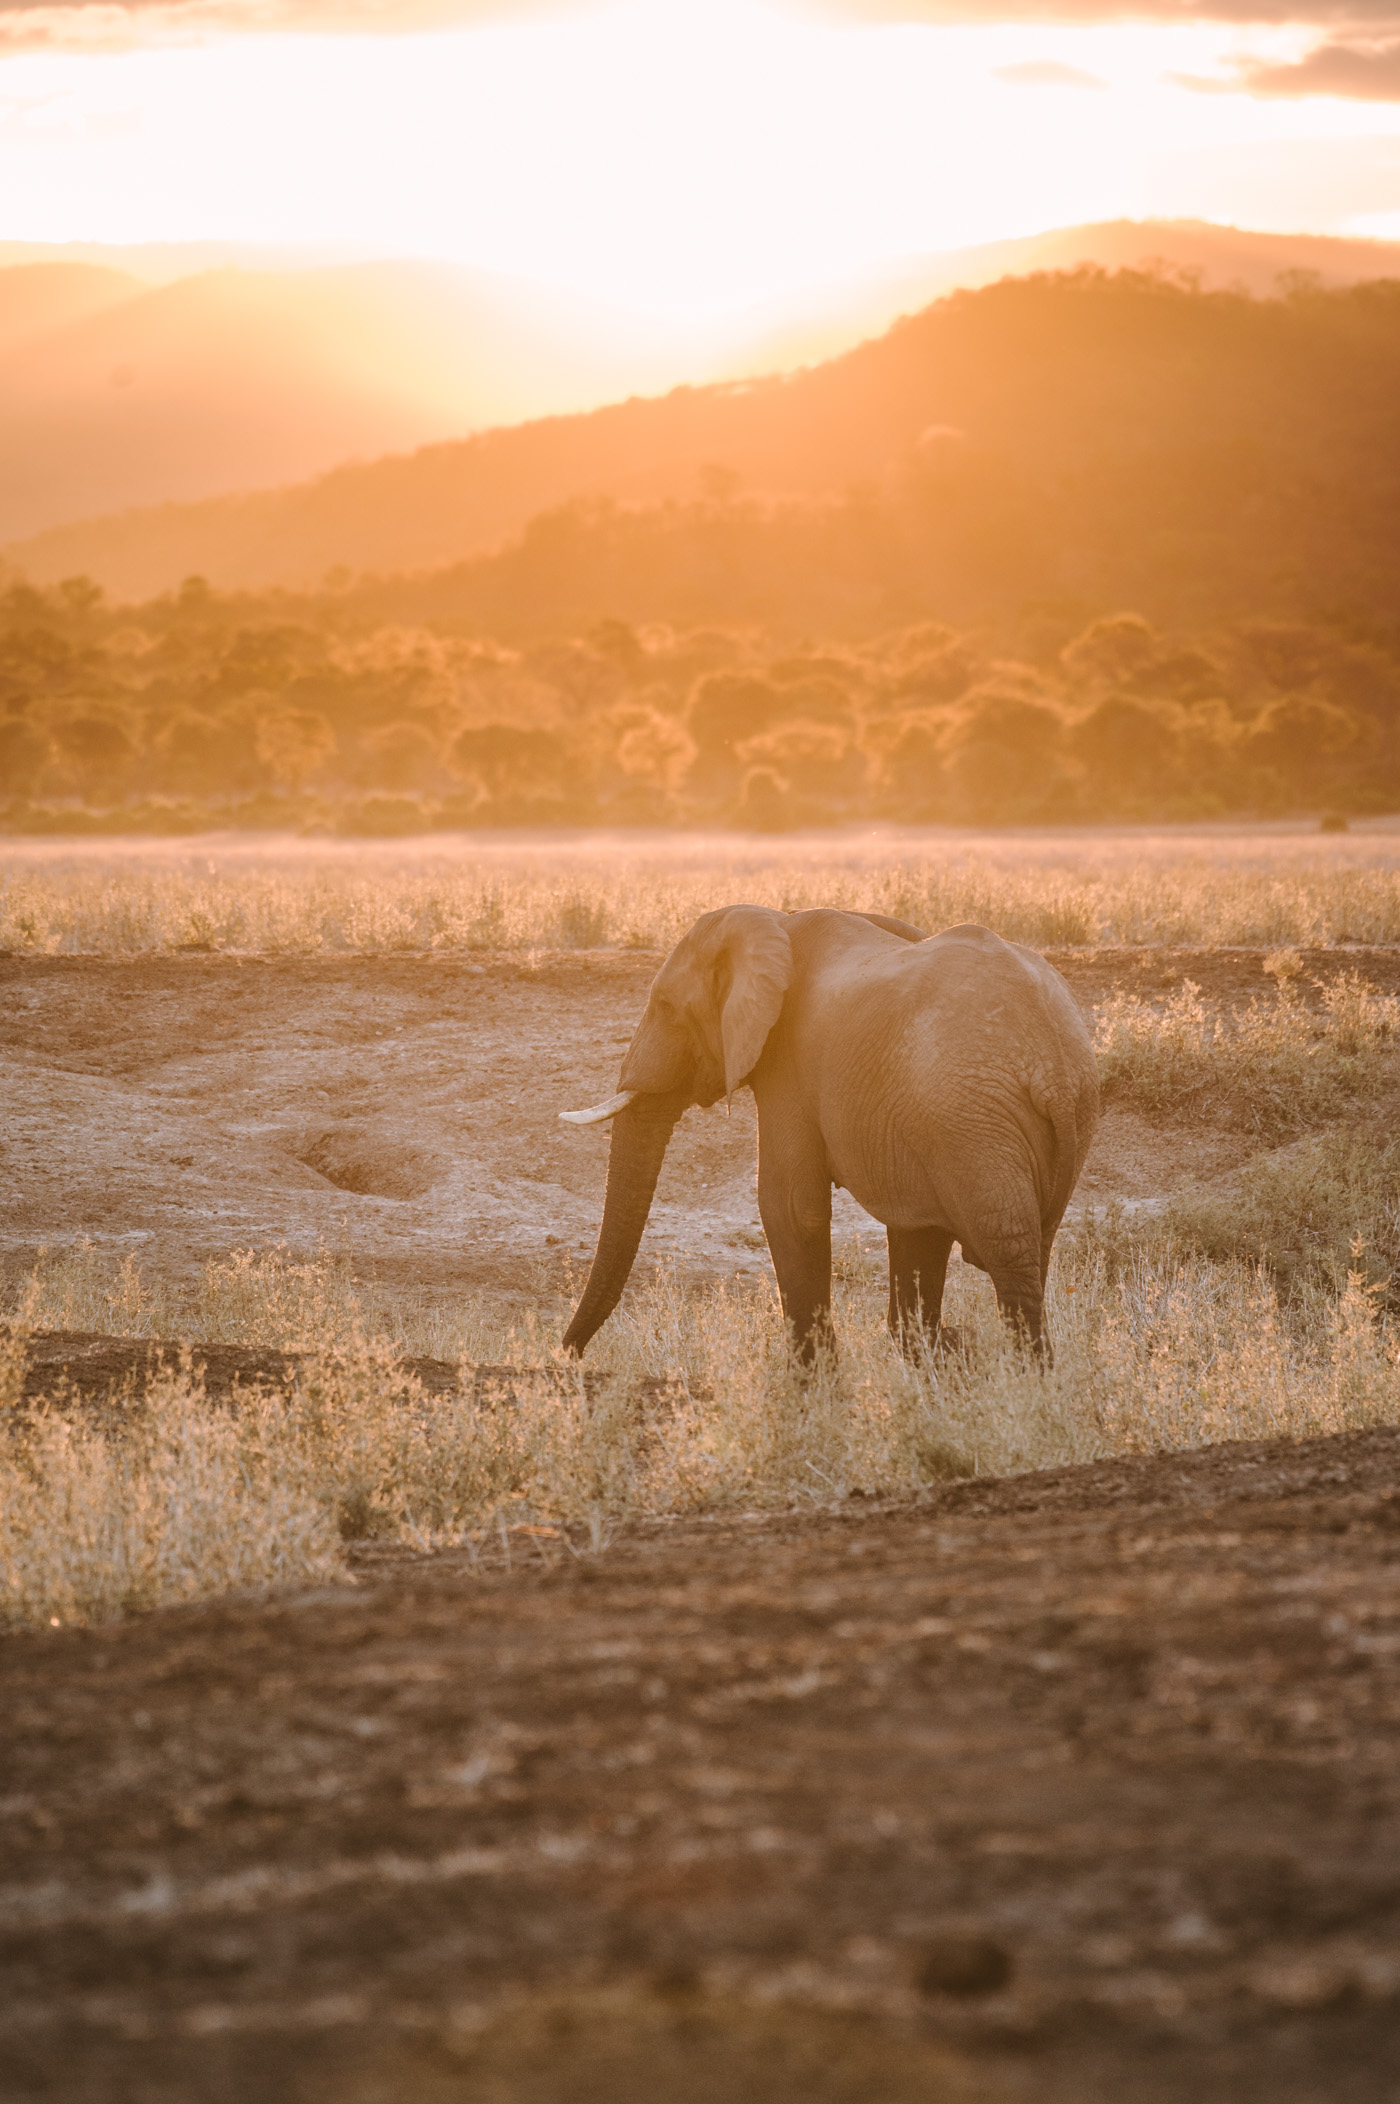 Elephant in Lower Zambezi National Park Zambia